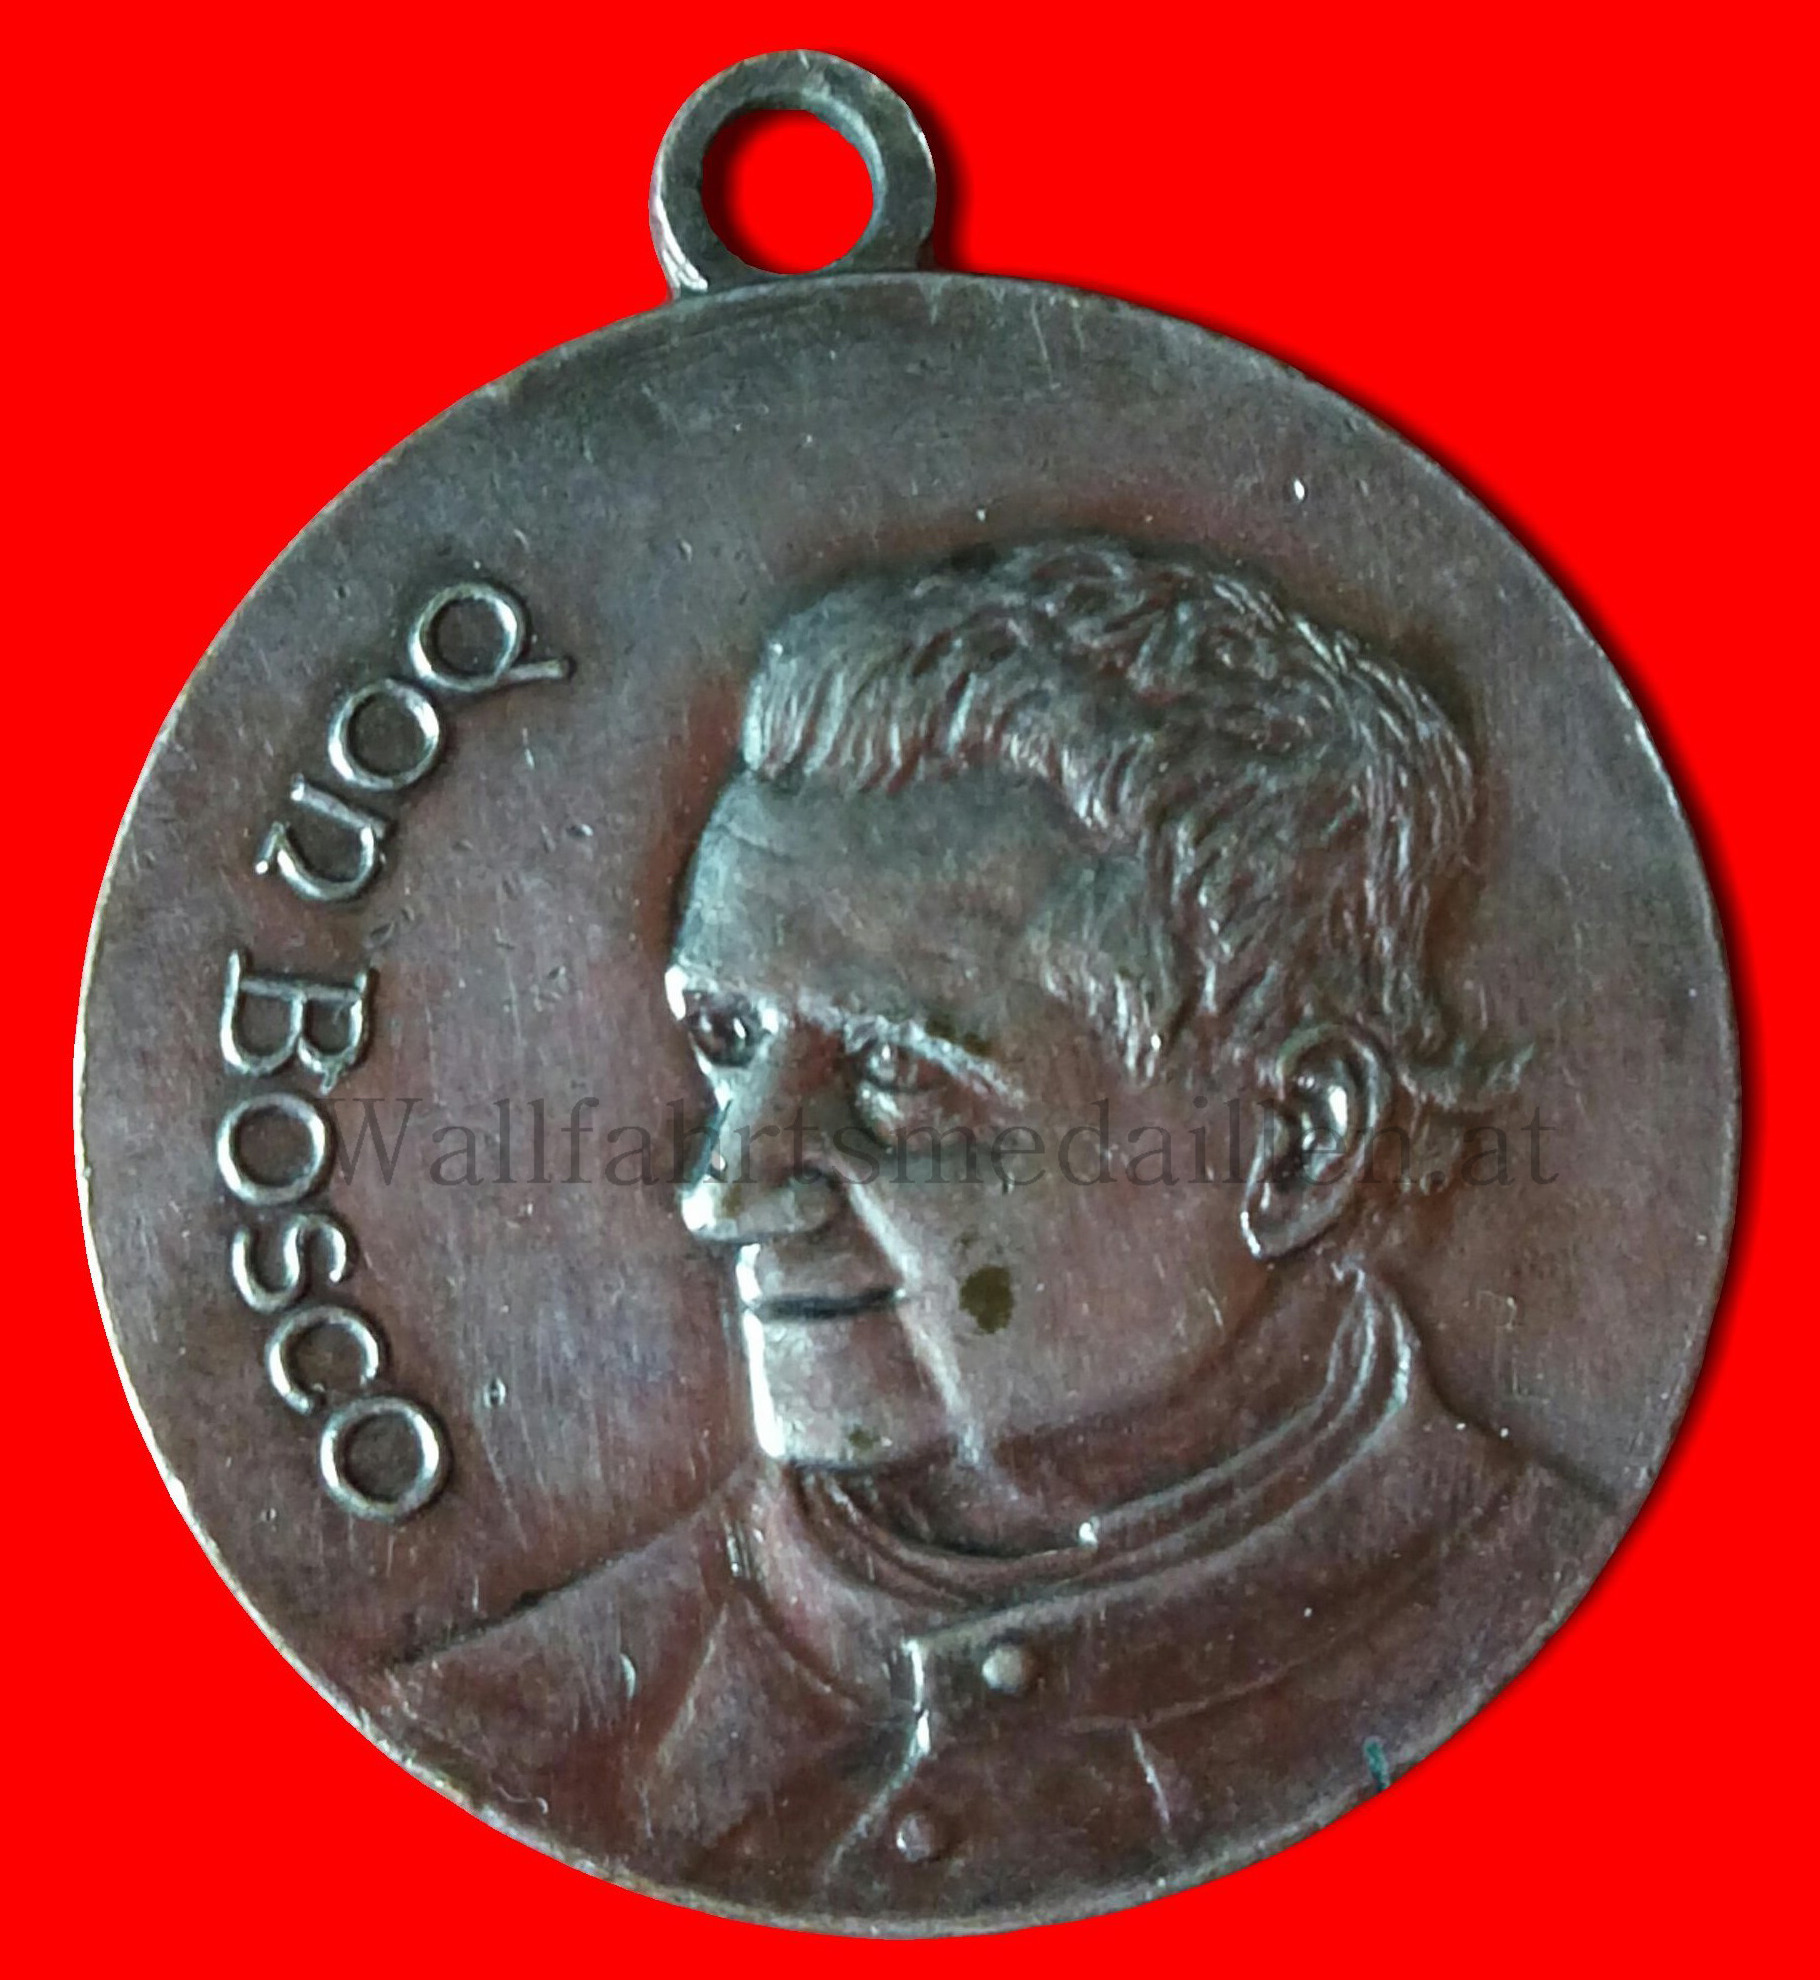 Johannes Bosco